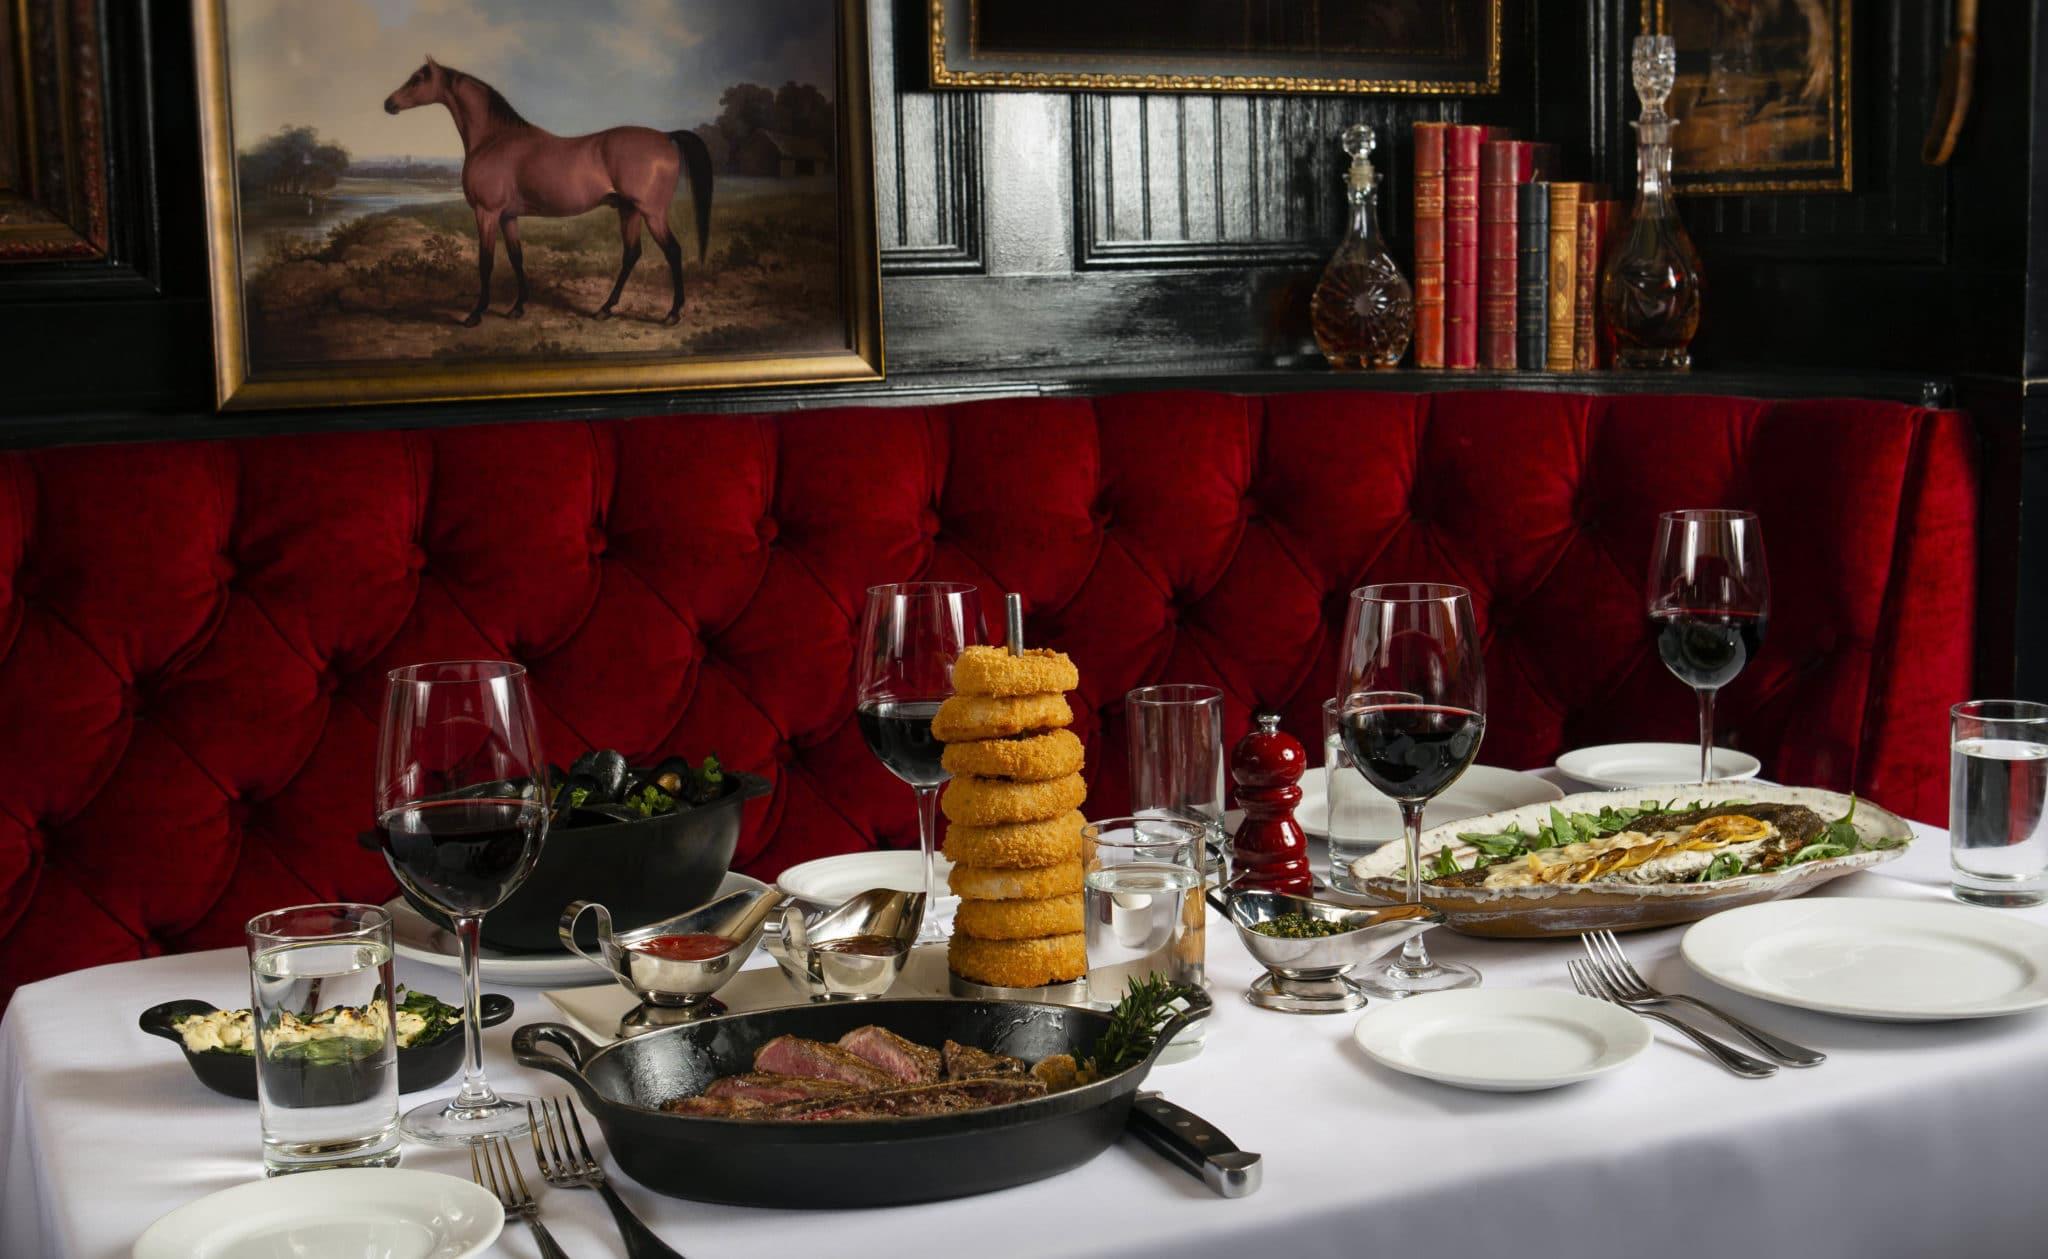 one of the best restaurants in aspen - steakhouse no 316